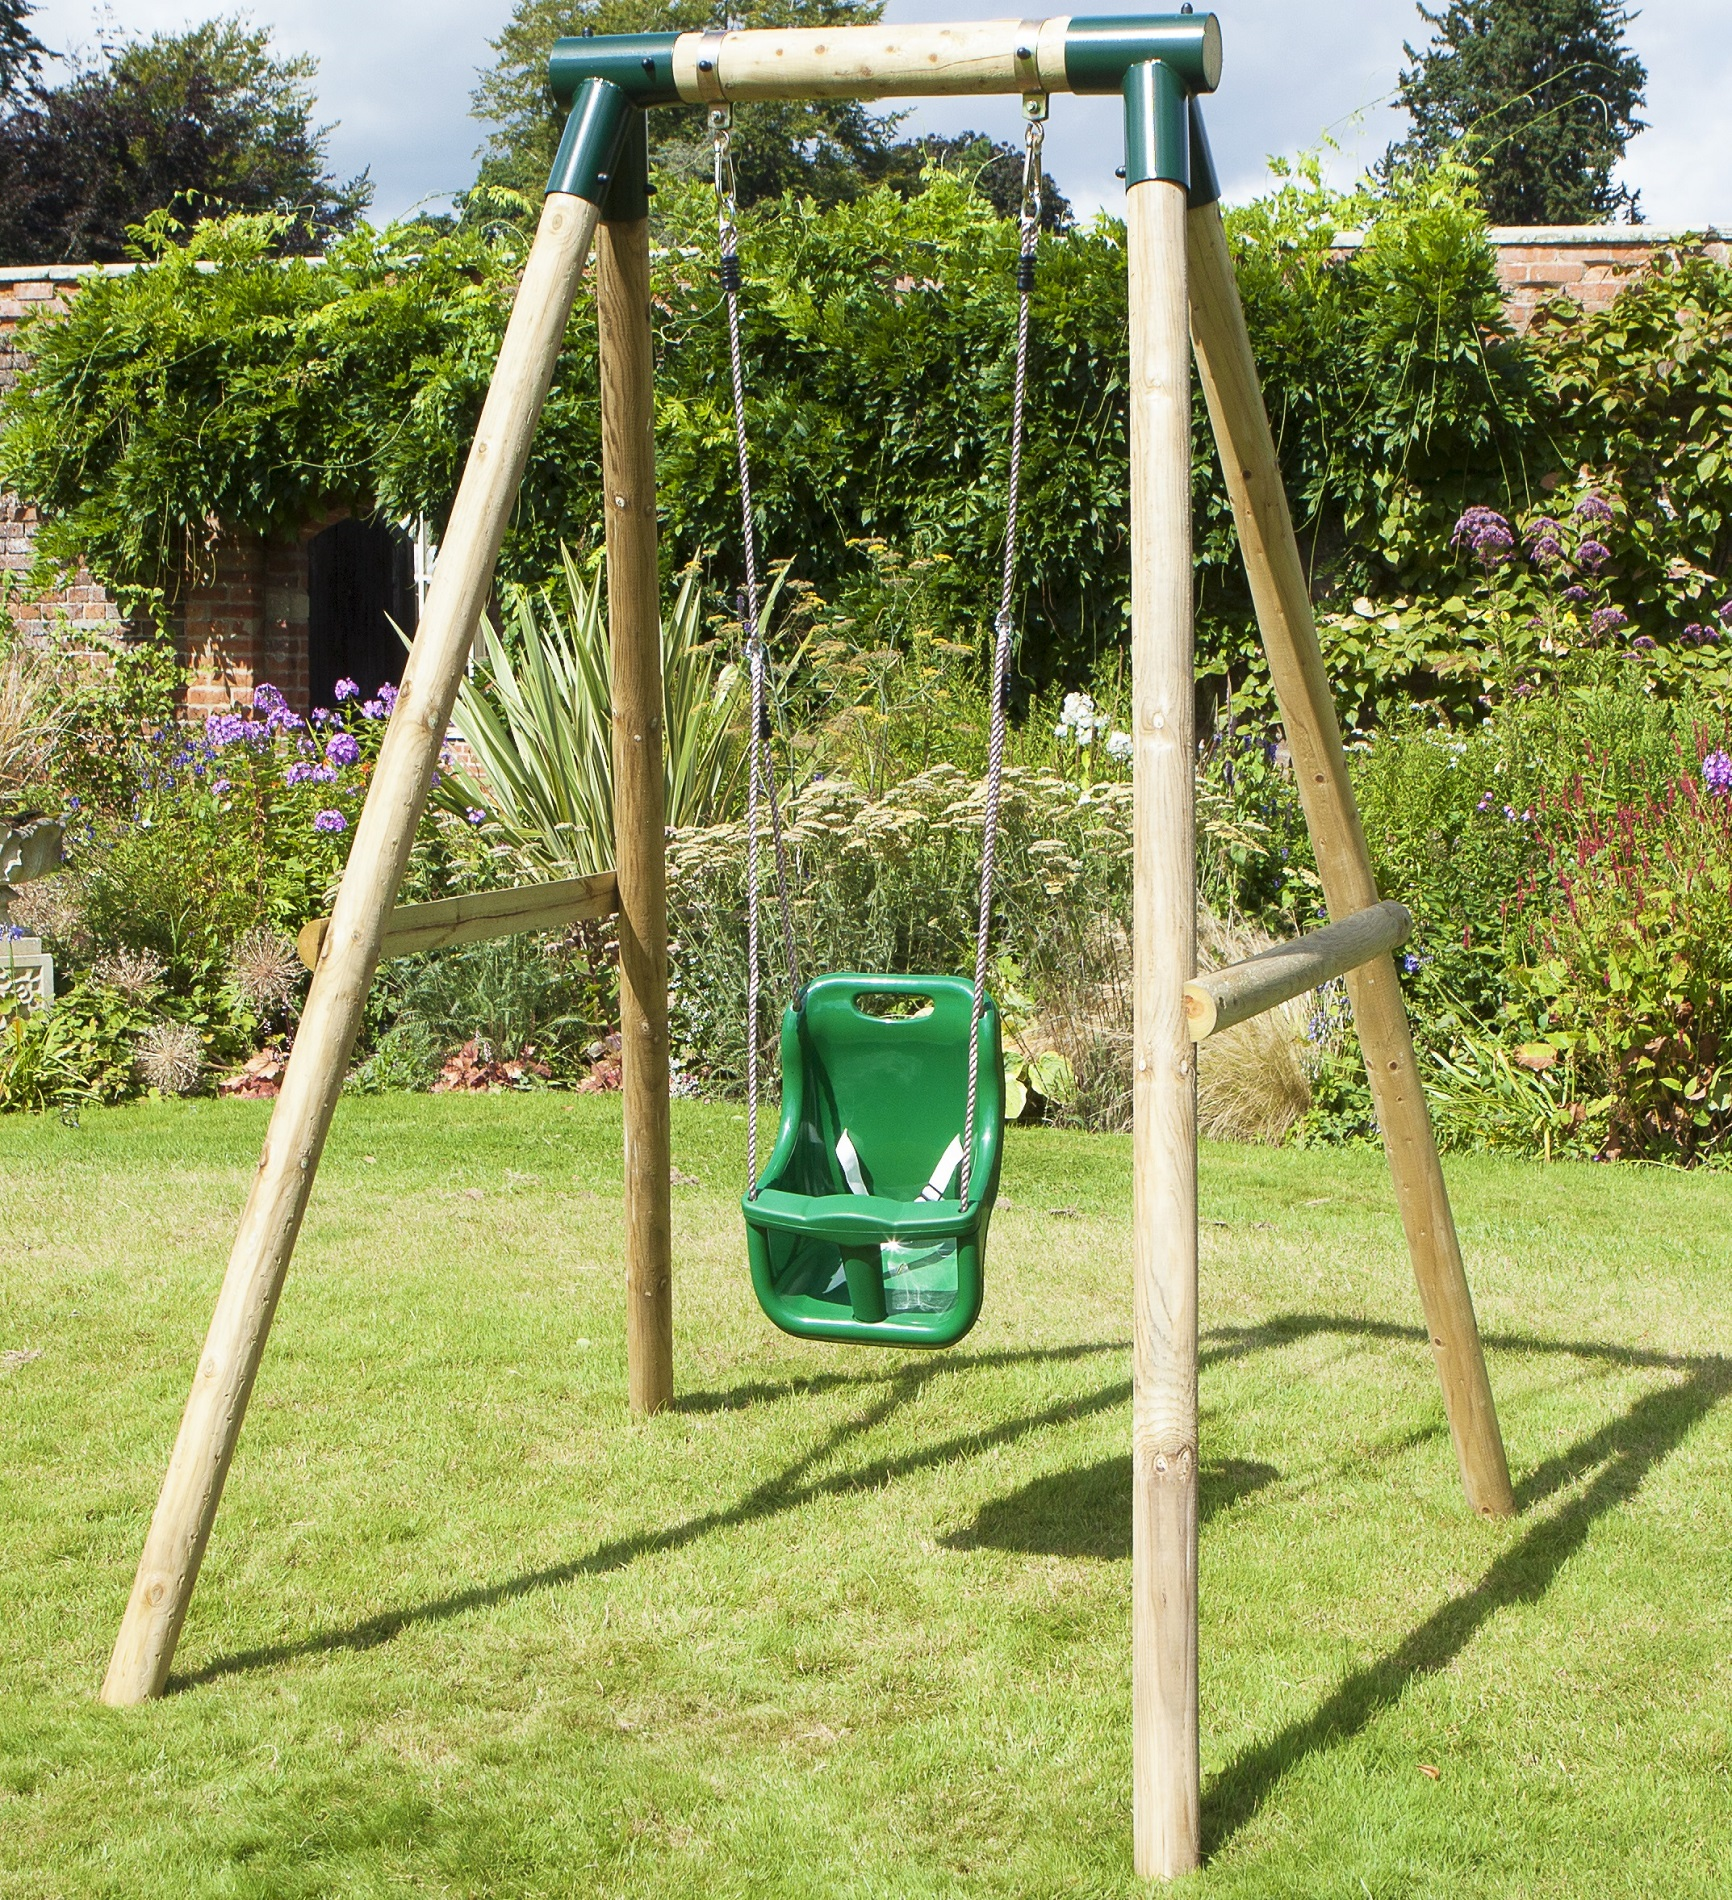 Rebo pluto baby wooden garden swing set baby swing ebay for Garden swing seat plans